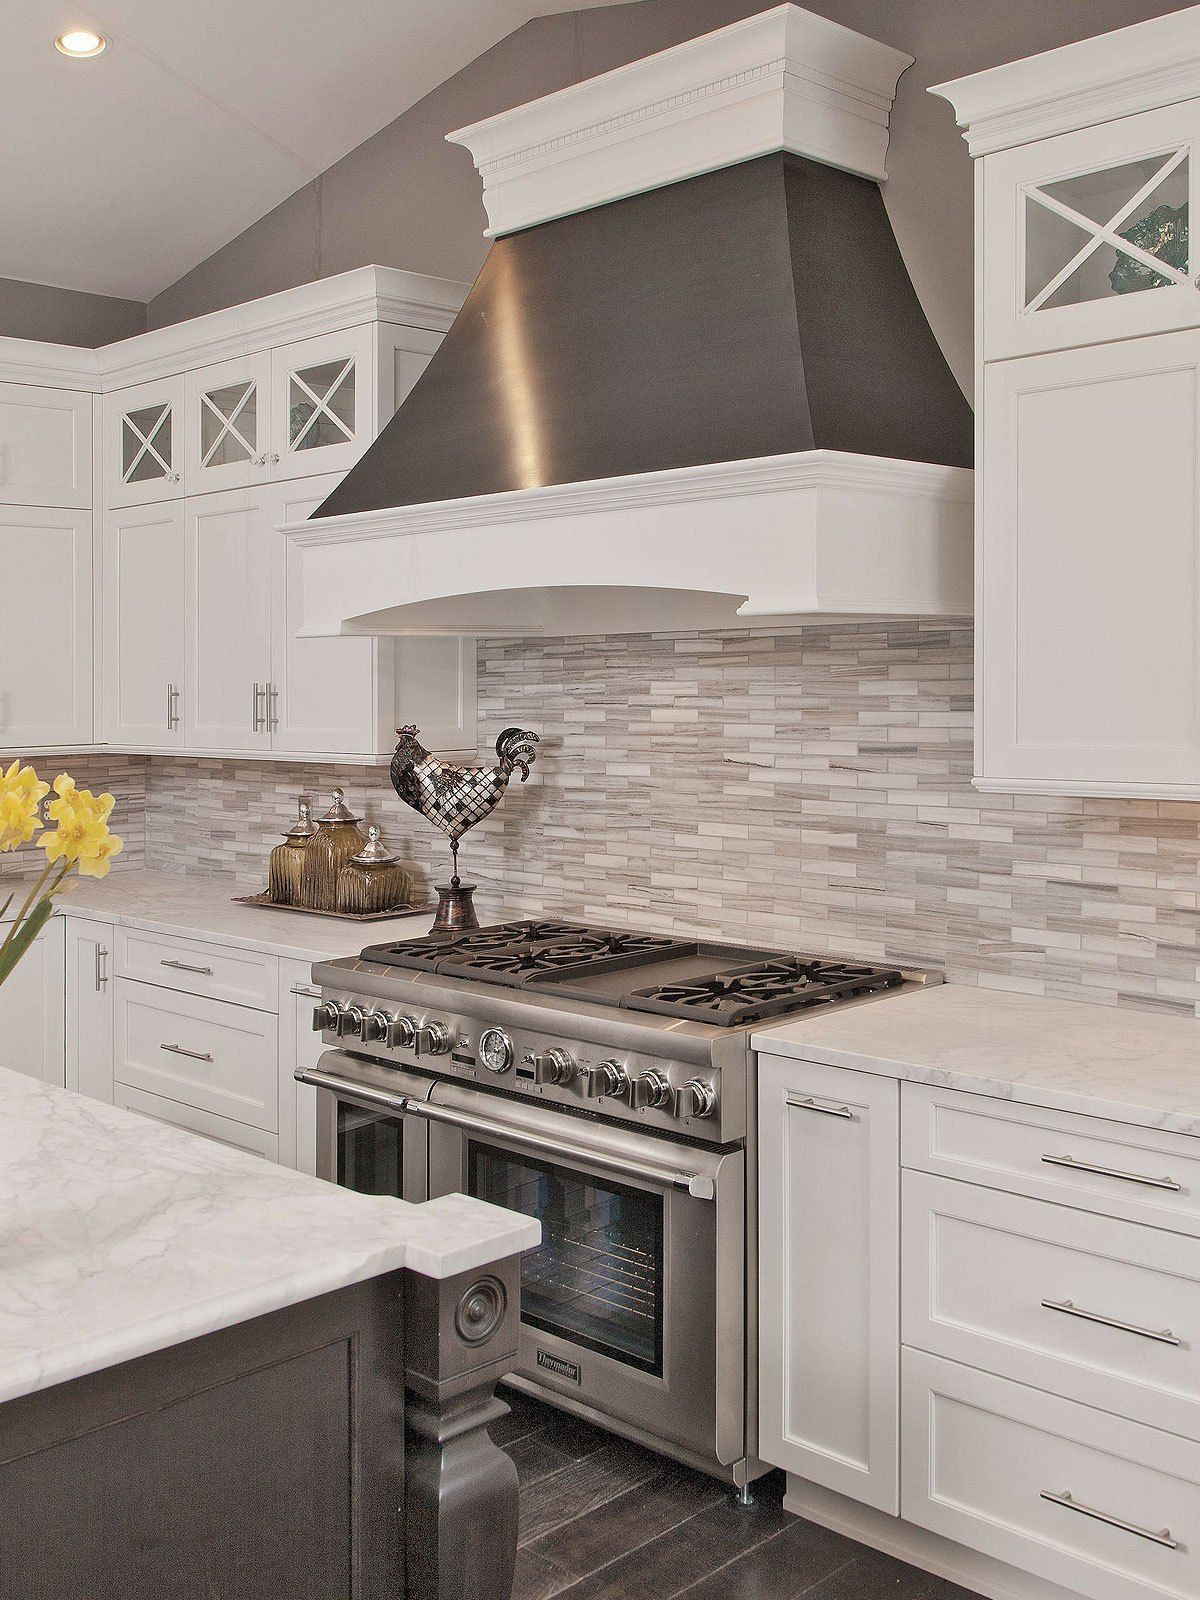 Modern White Gray Subway Marble Backsplash Tile In 2020 Kitchen